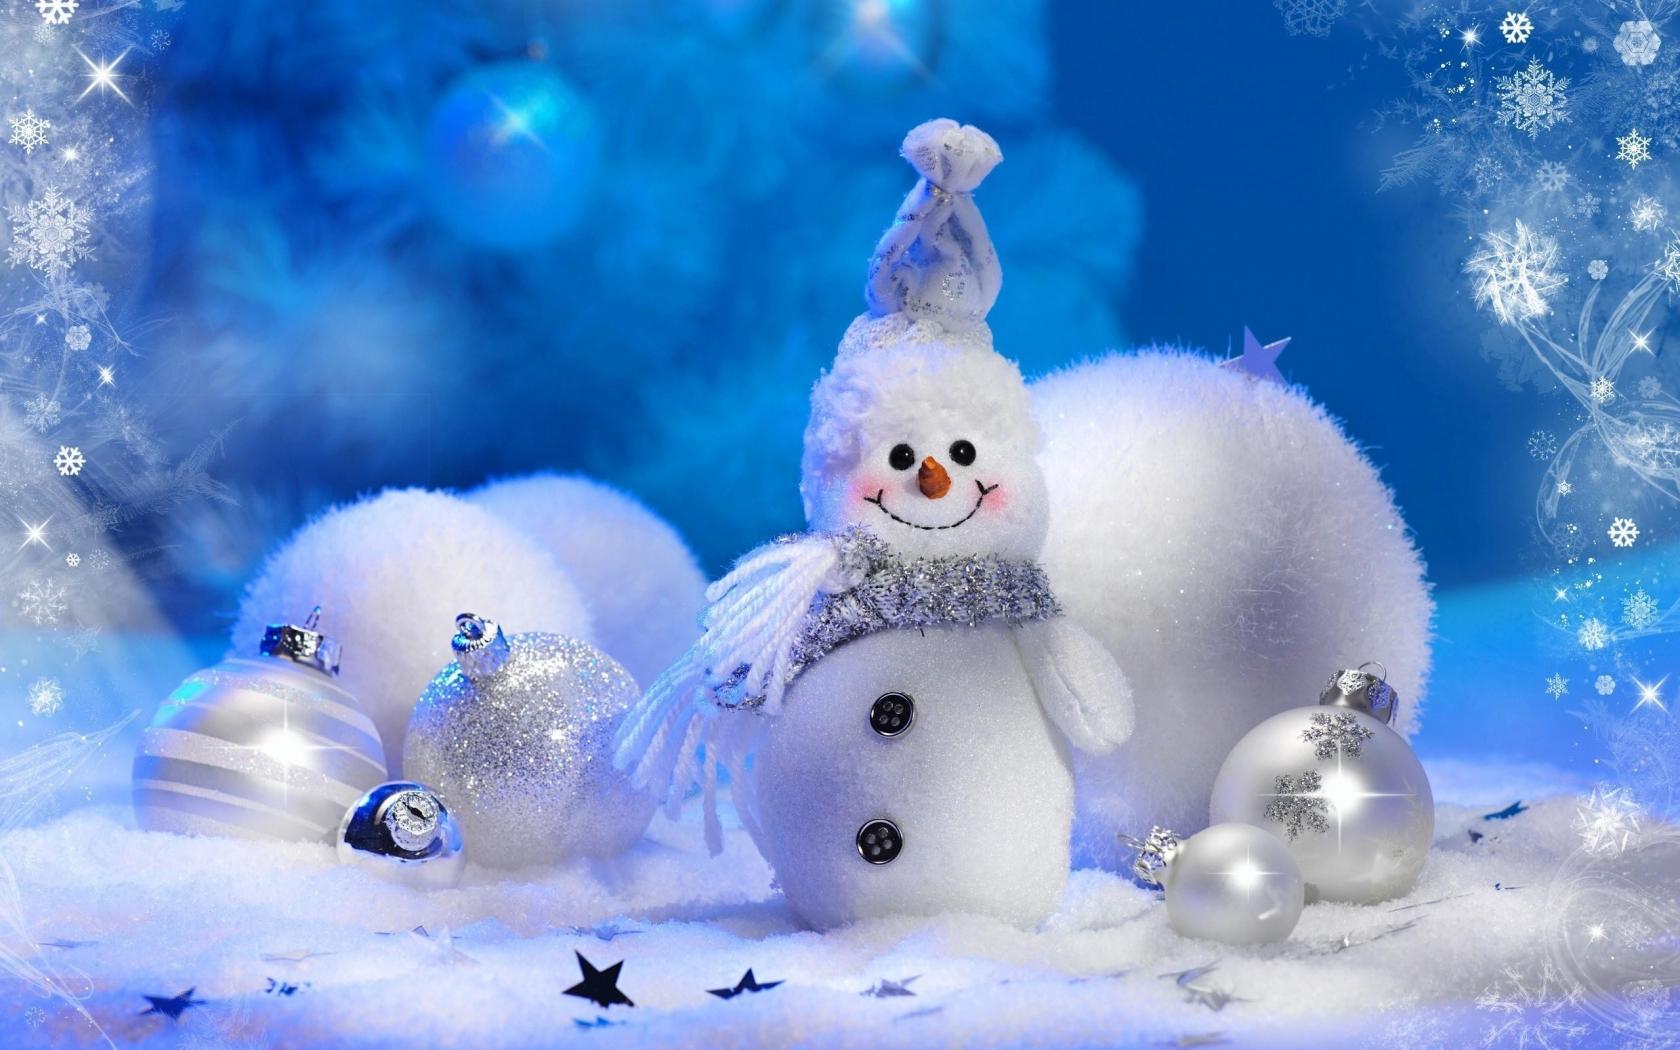 Peluche de navidad - 1680x1050